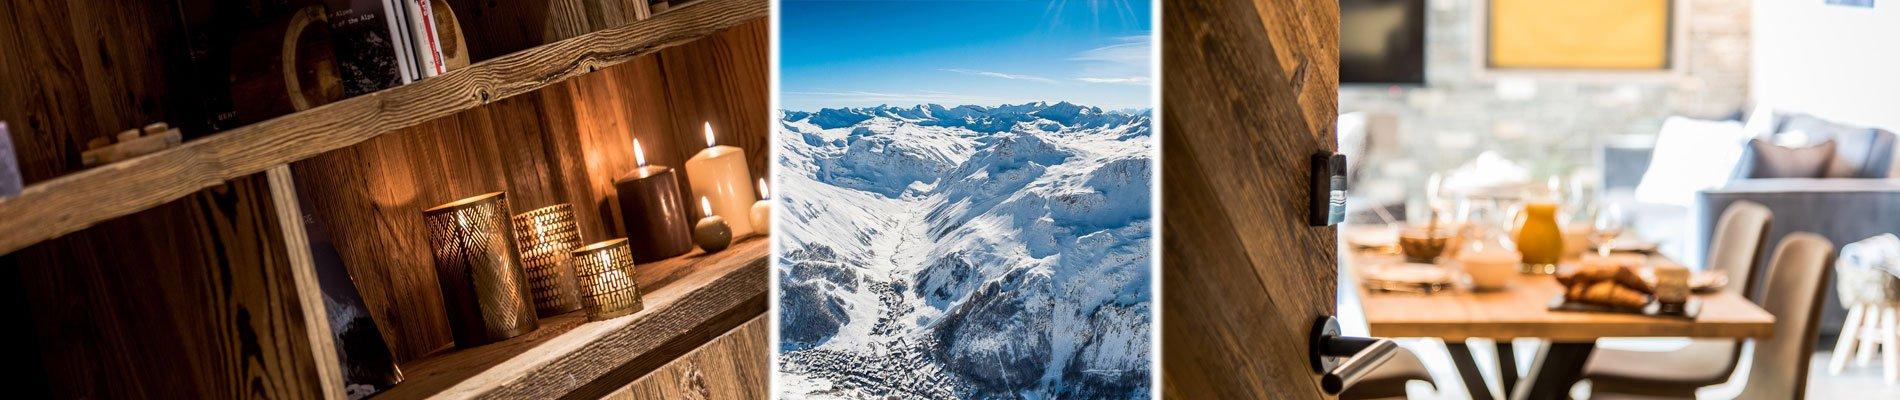 village-montana-izia-val-d-isere-frankrijk-wintersport